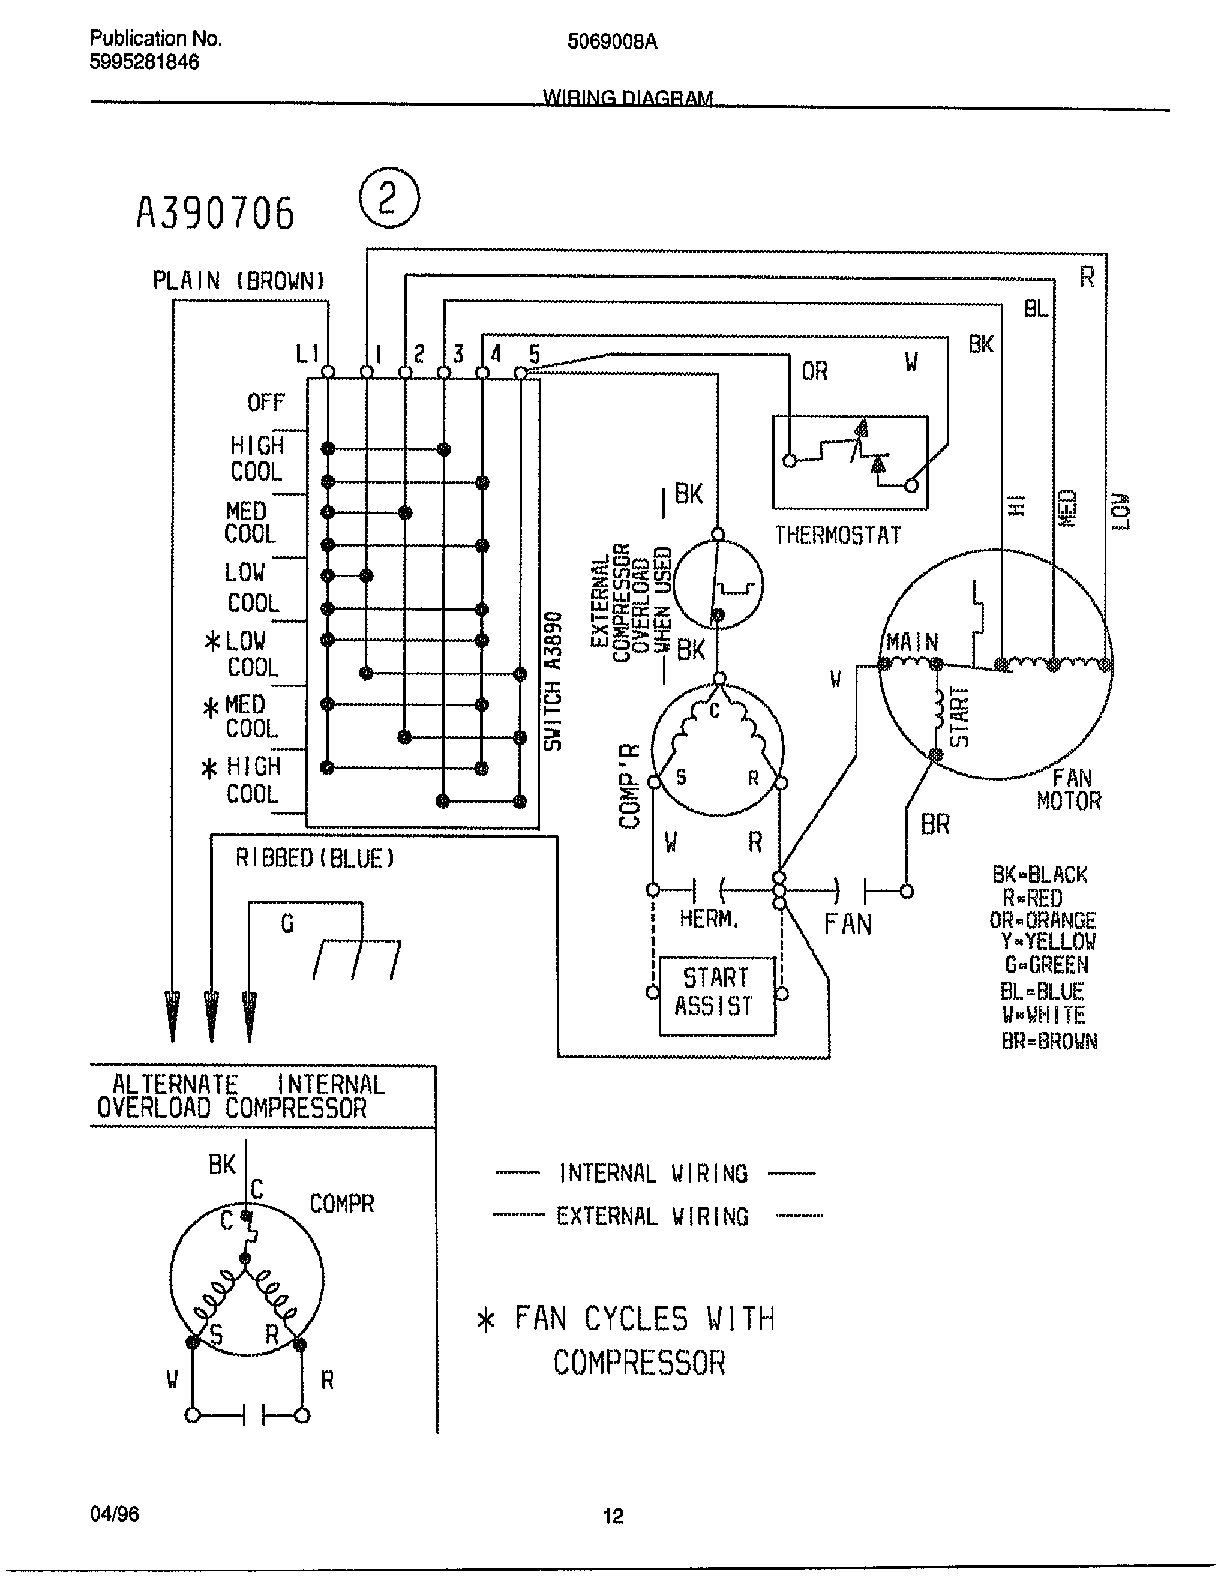 MF_6319] Frigidaire Air Handler Wiring Diagrams Schematic WiringAnal Inst Aryon Sapebe Numap Cette Mohammedshrine Librar Wiring 101